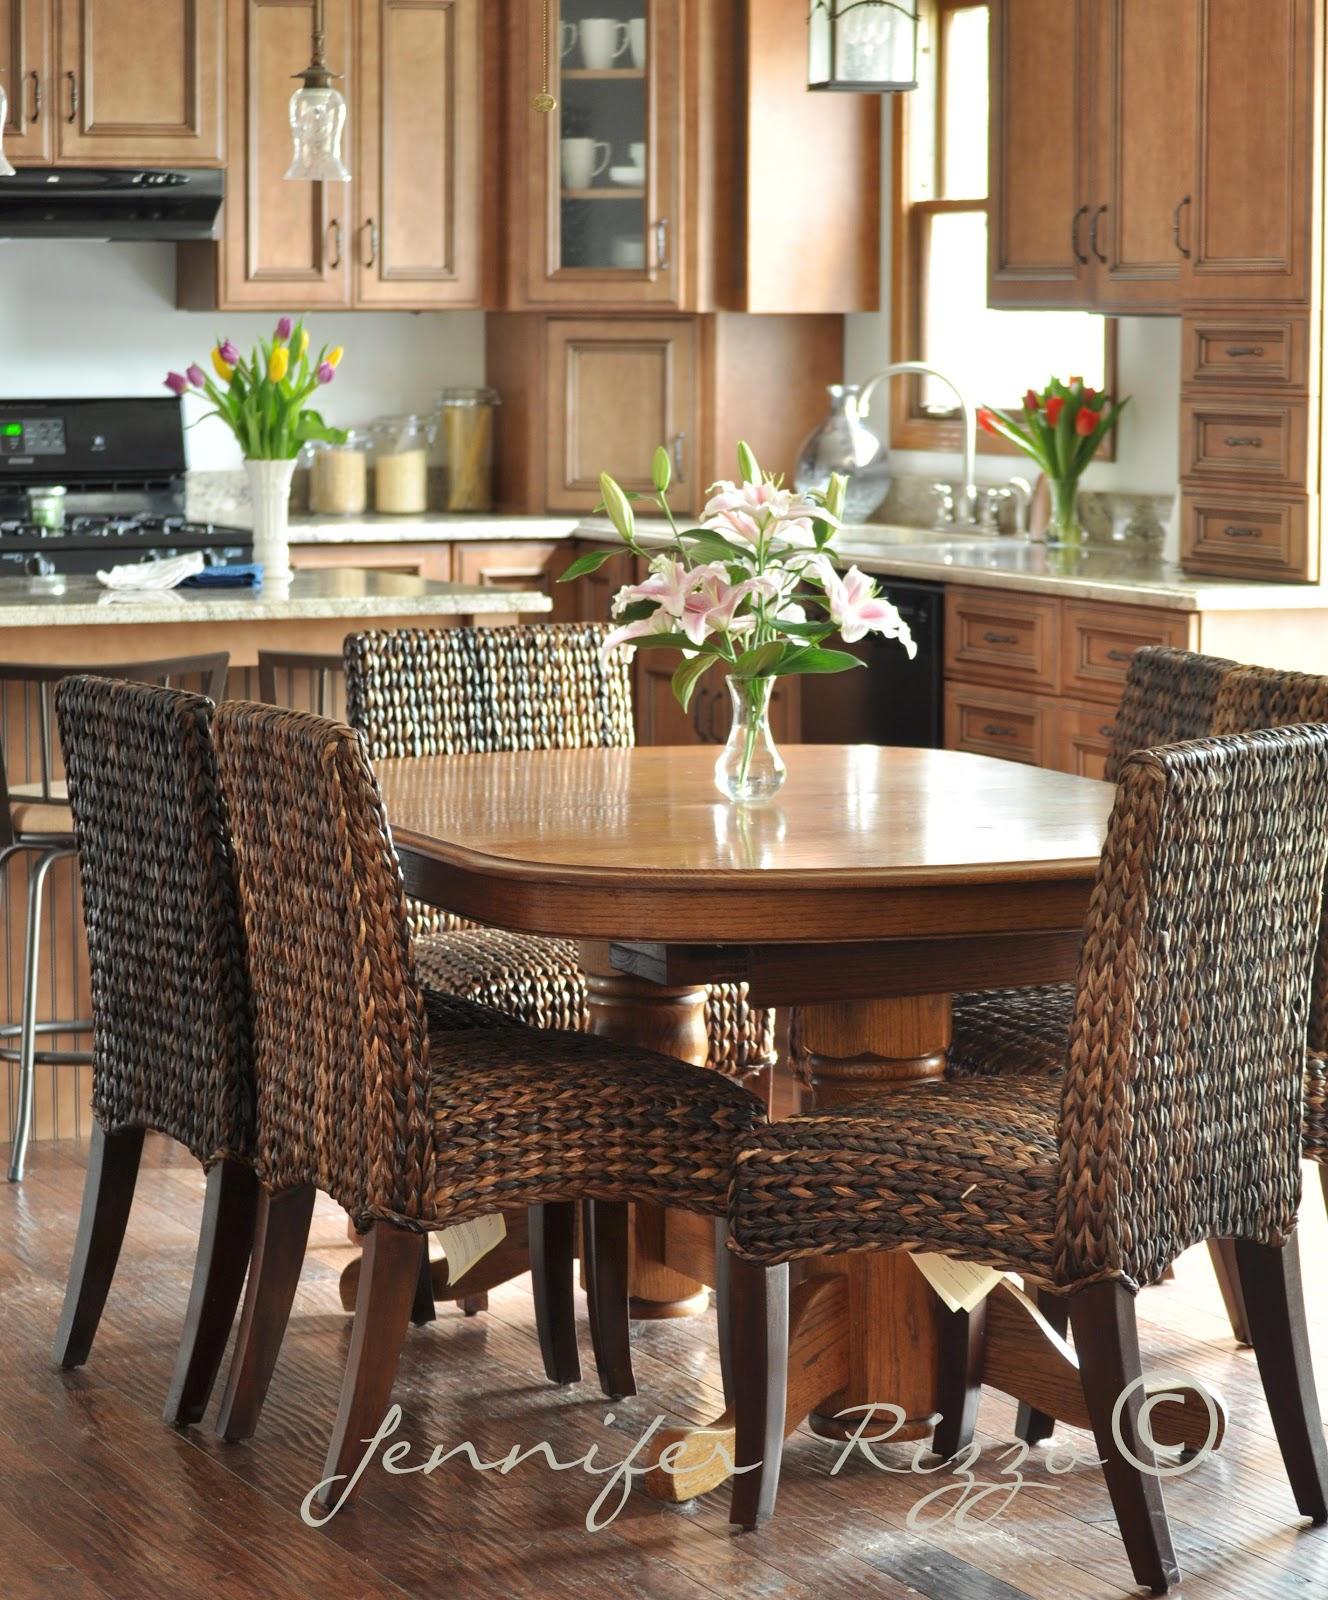 Rattan Kitchen Furniture My Moms New Kitchen Jennifer Rizzo